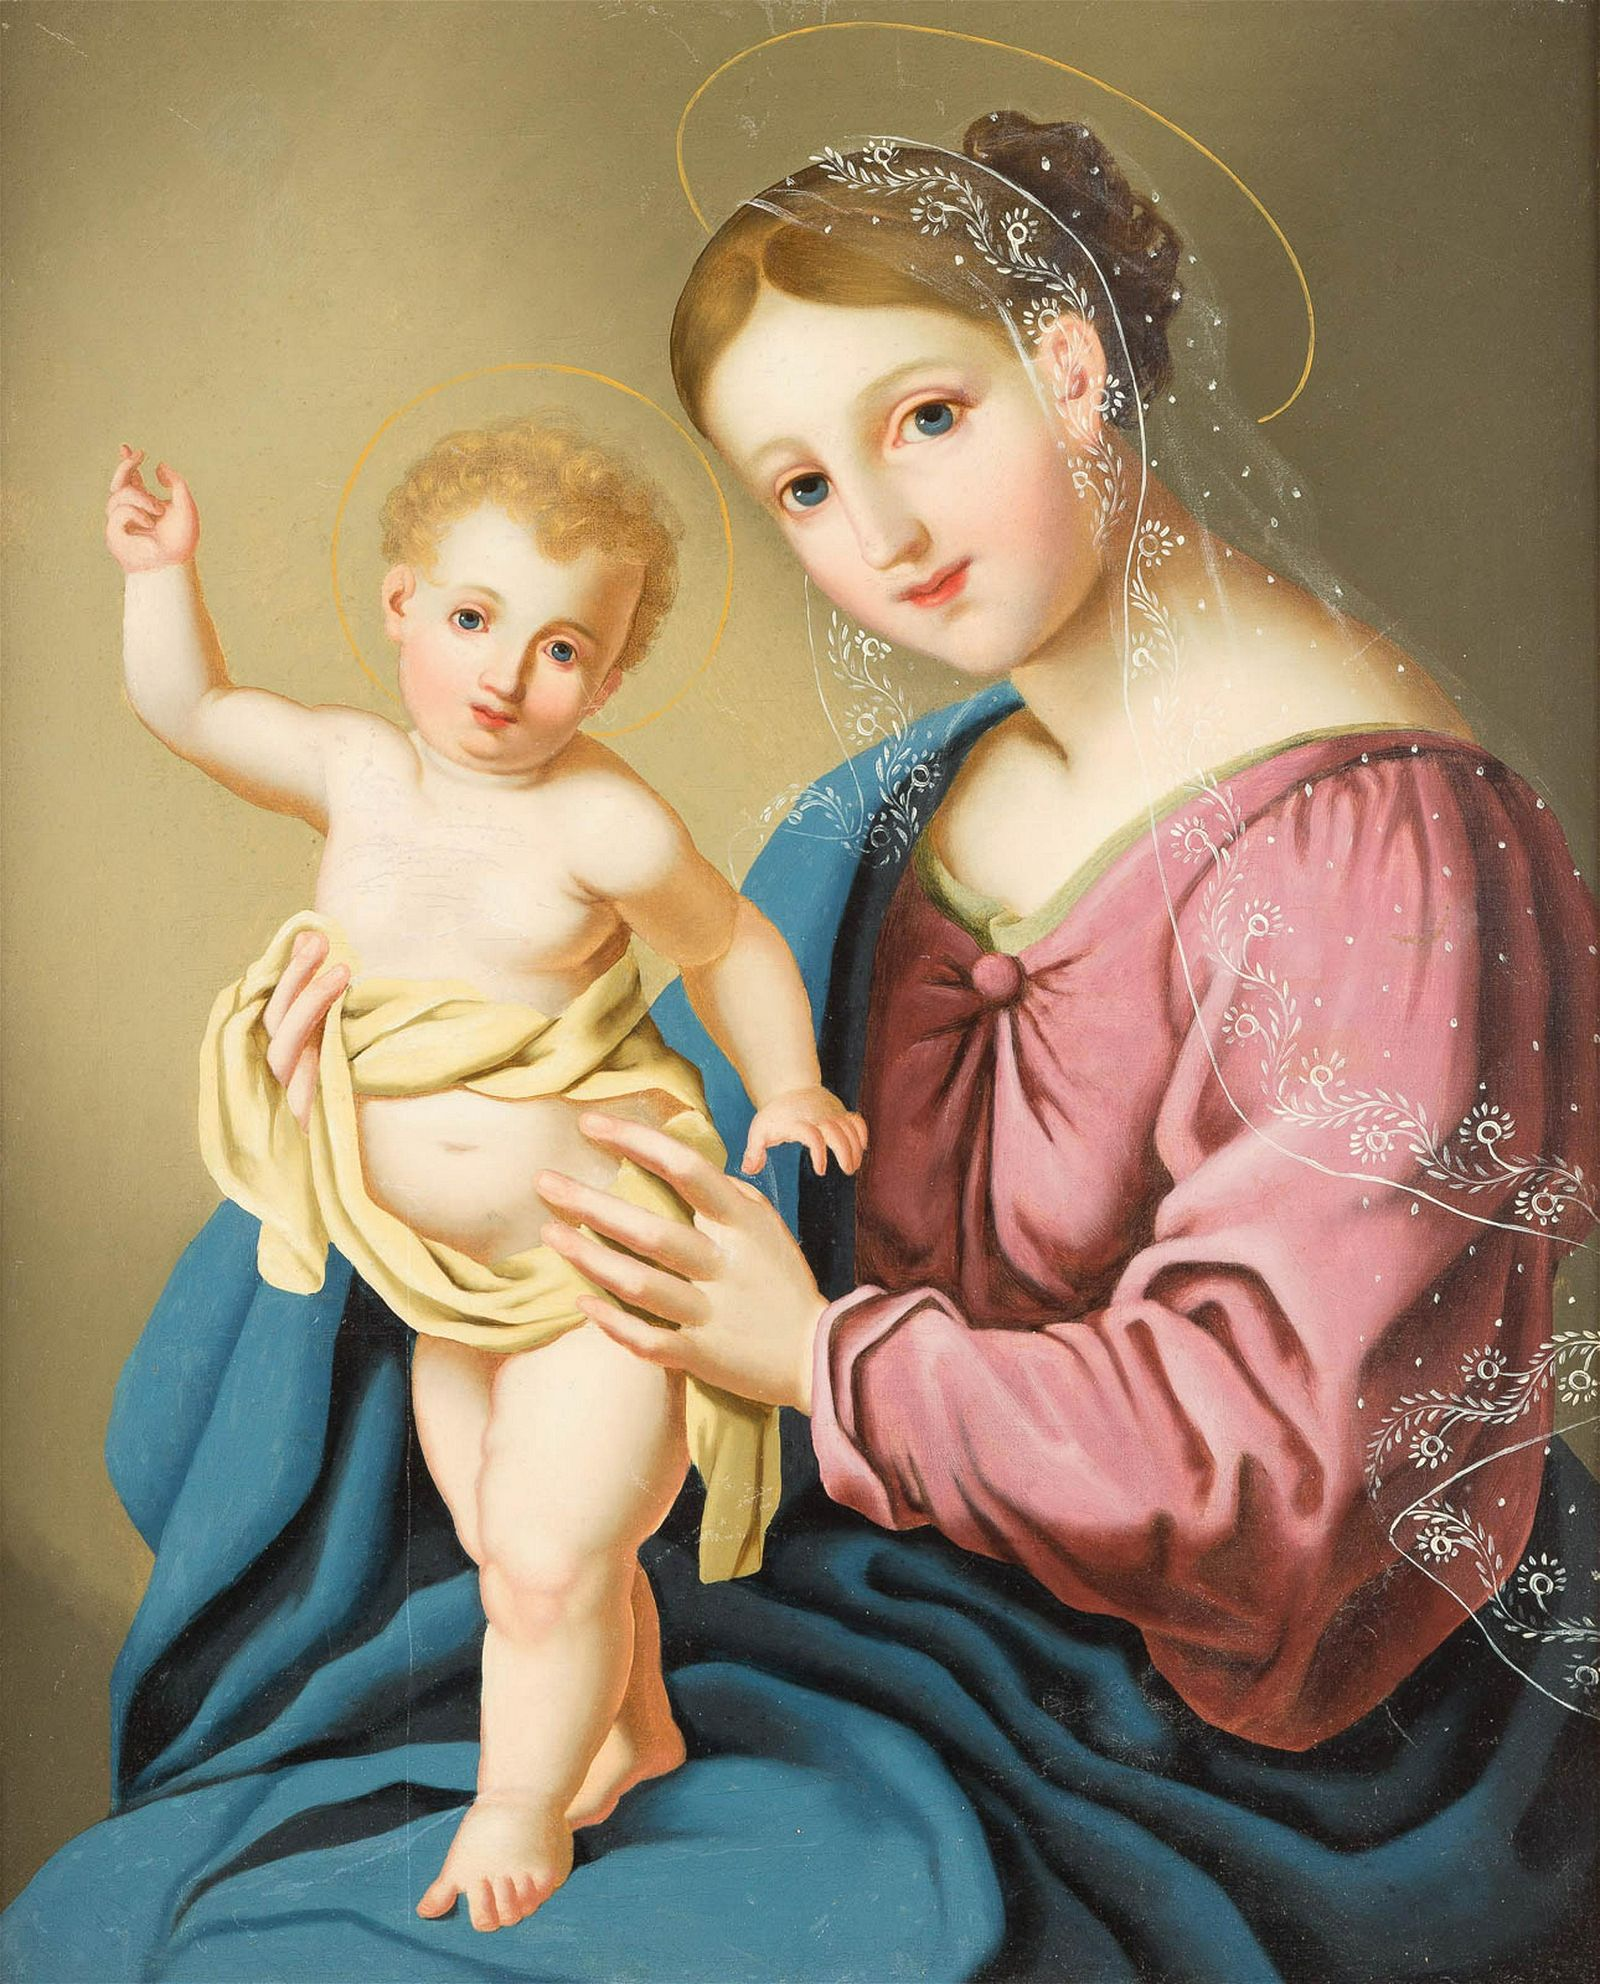 GERMAN/AUSTRIAN SCHOOL mid 19th C. Virgin Mary with